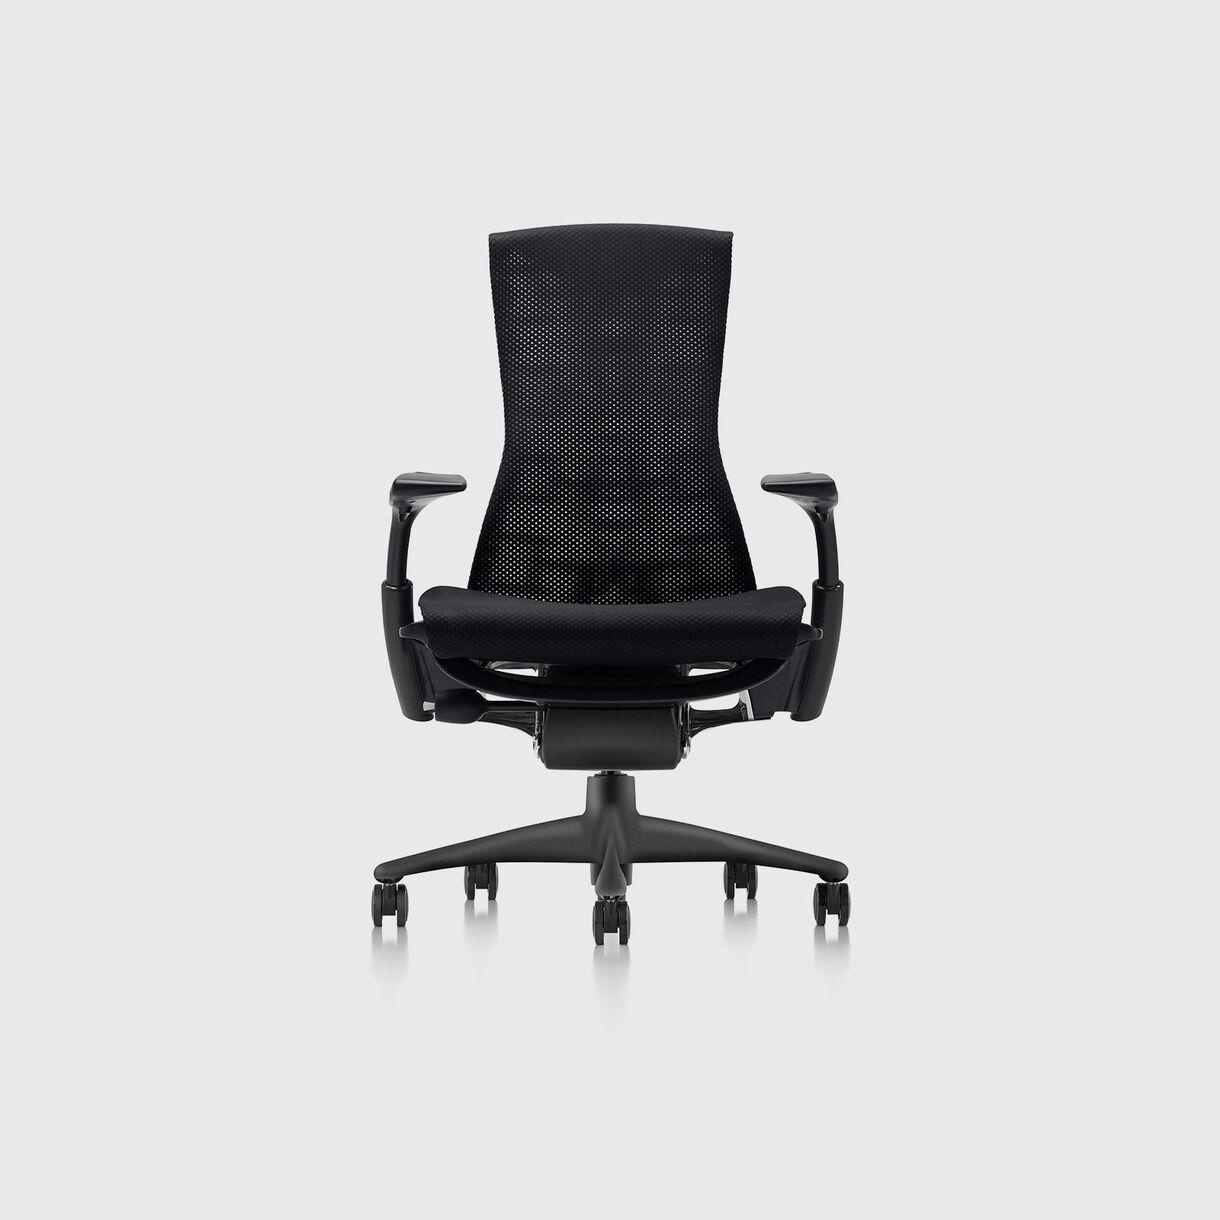 Embody Chair, Rhythm Black with Graphite Base